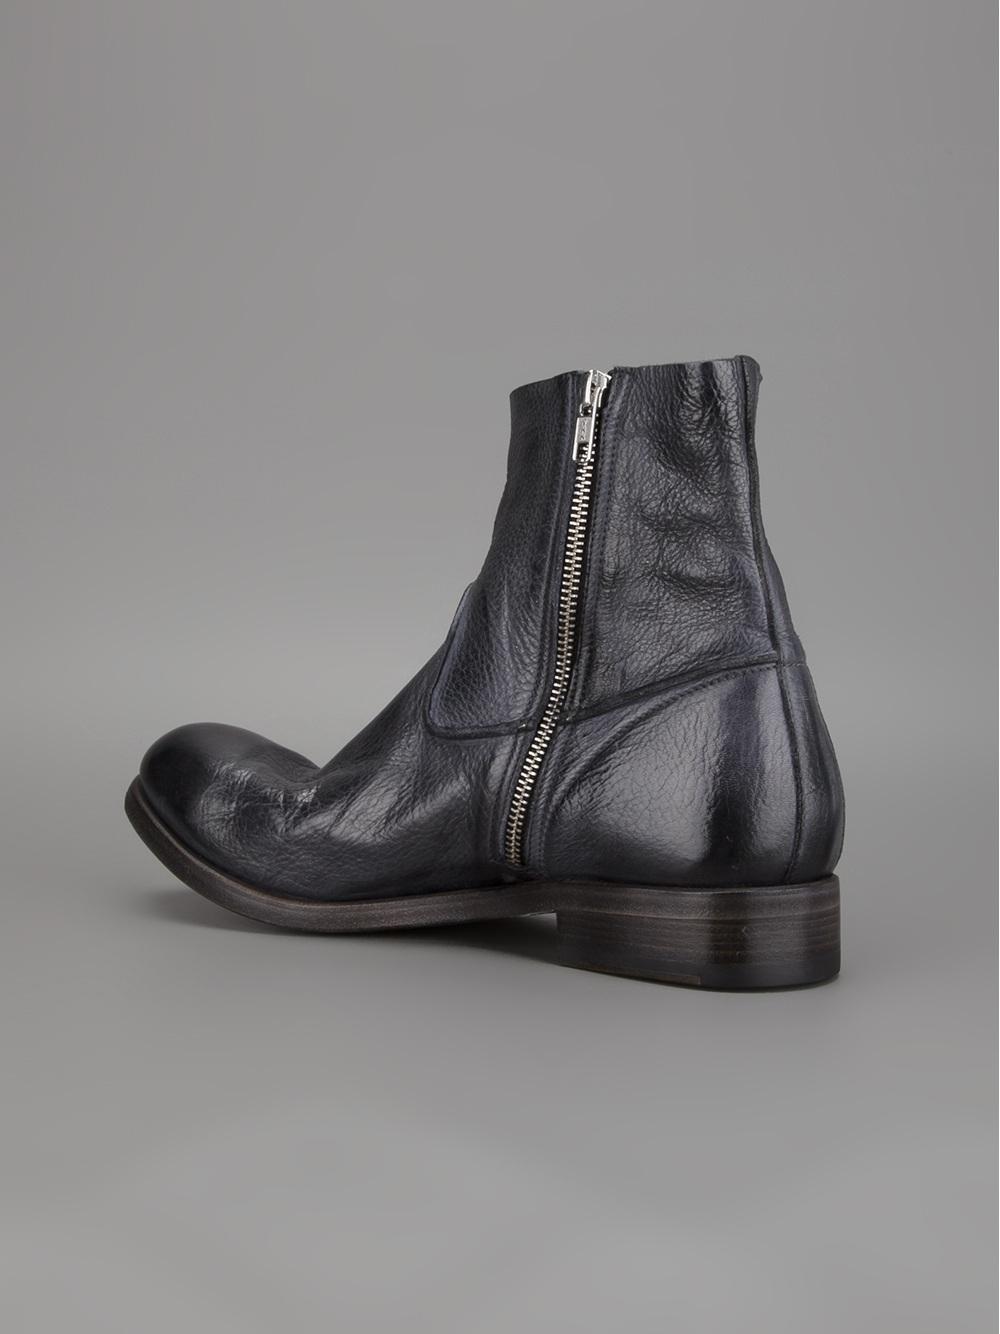 FOOTWEAR - Ankle boots Silvano Sassetti 7vLYtXP